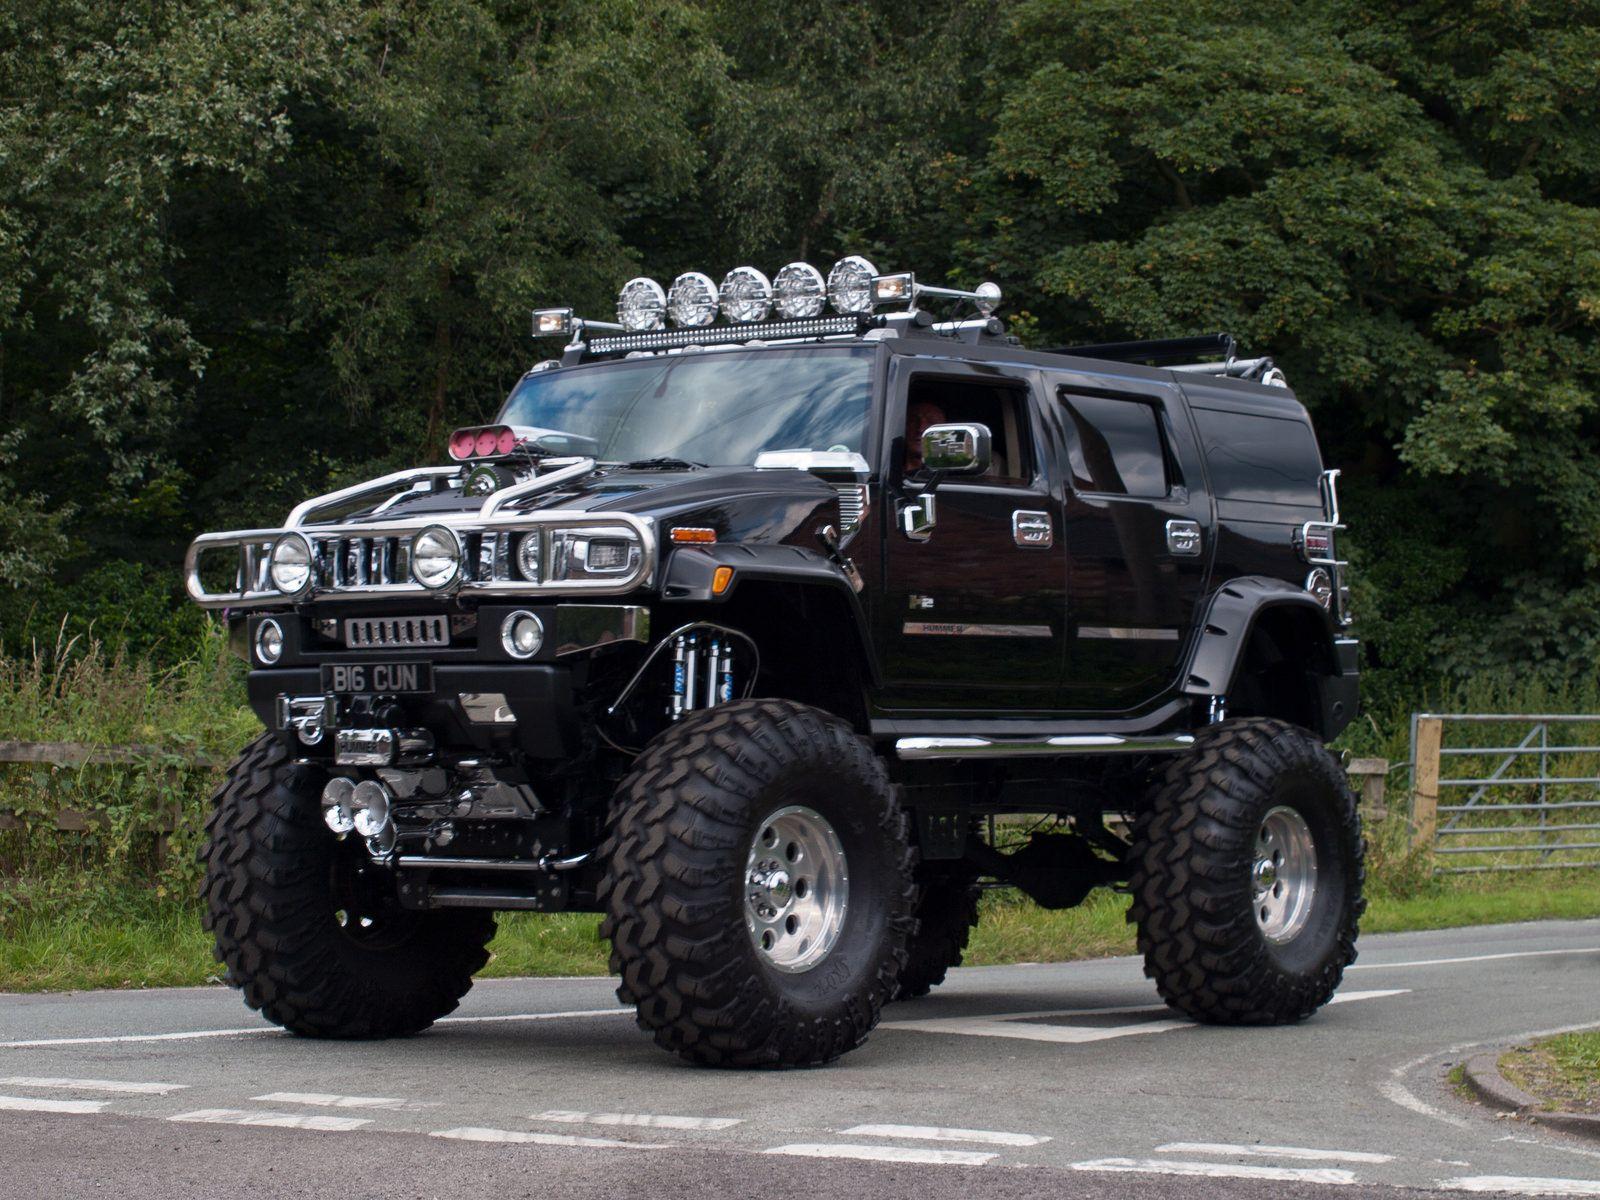 B16 Cun Hummer H2 Hummer H2 Hummer Hummer Cars